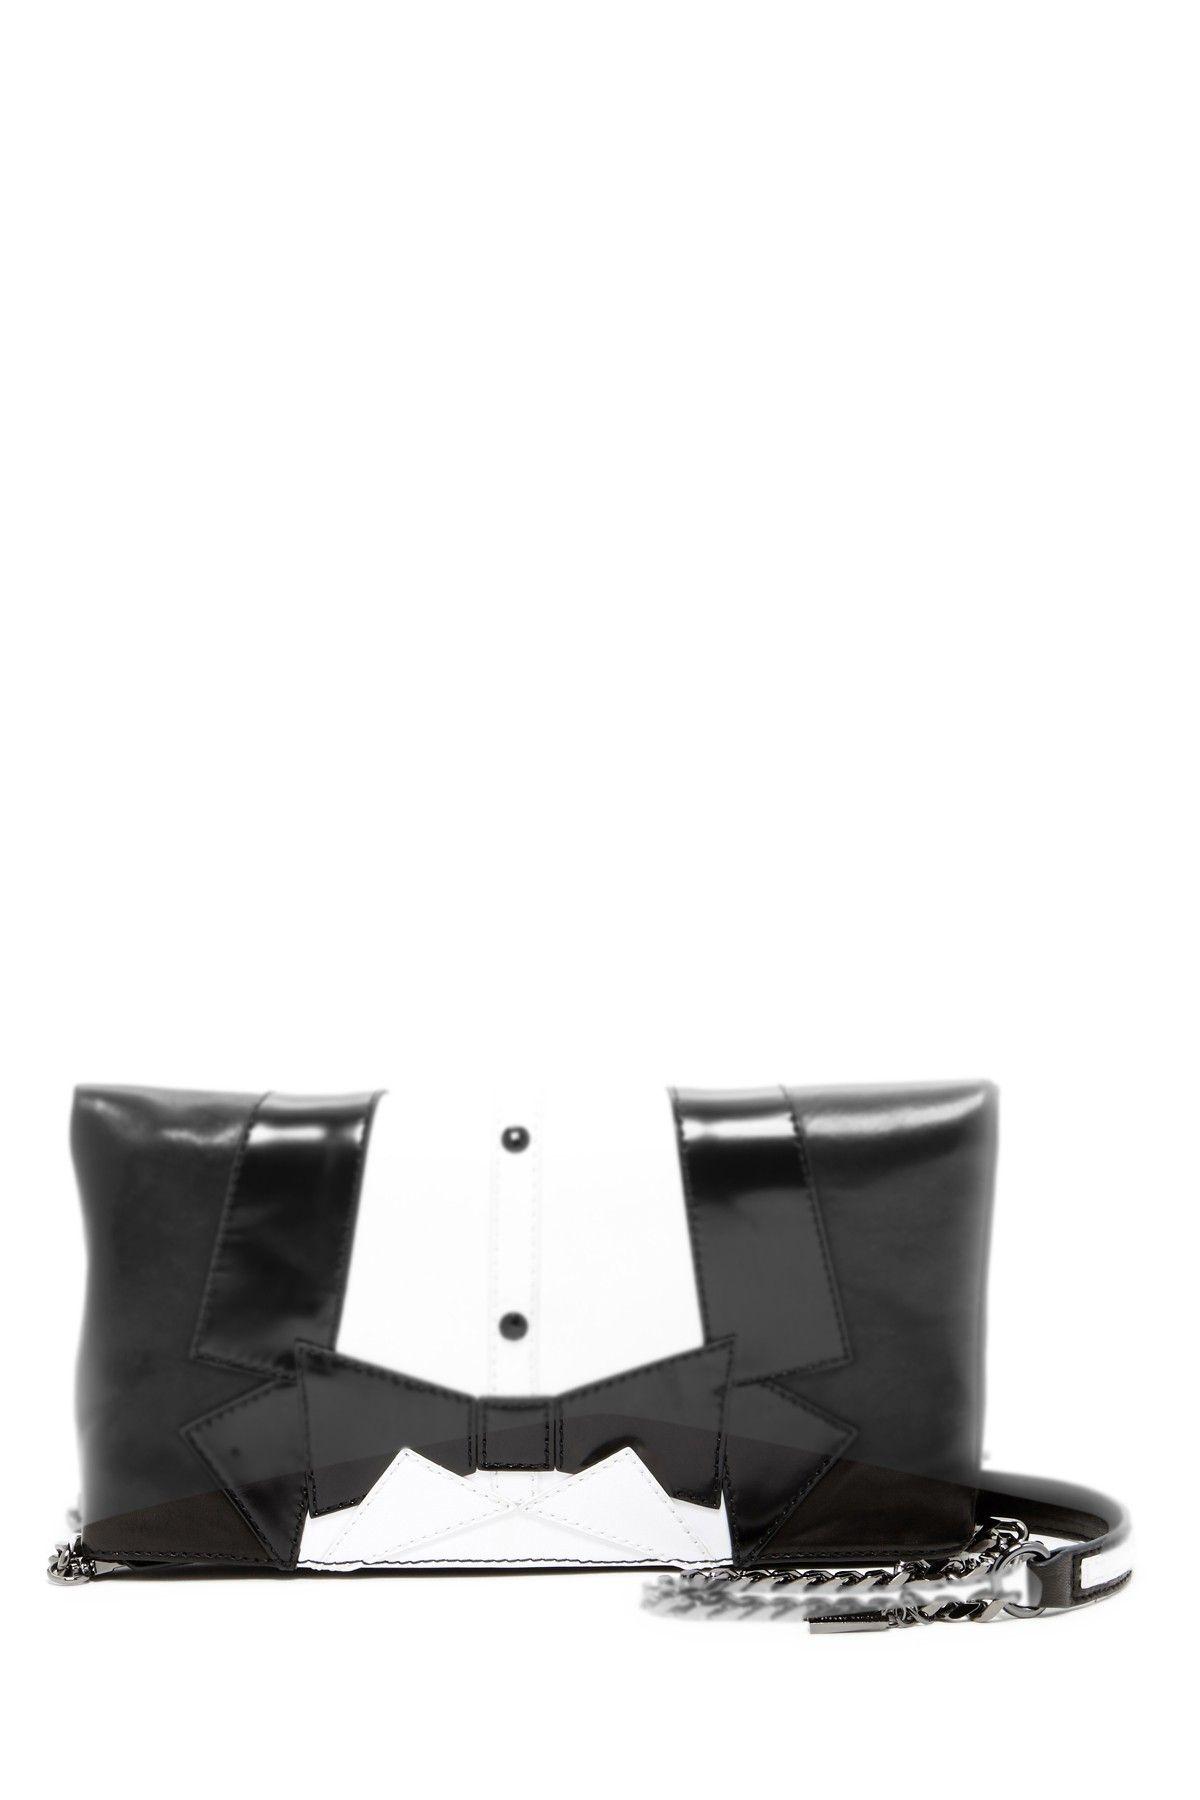 Tuxedo Me Leather Foldover Clutch